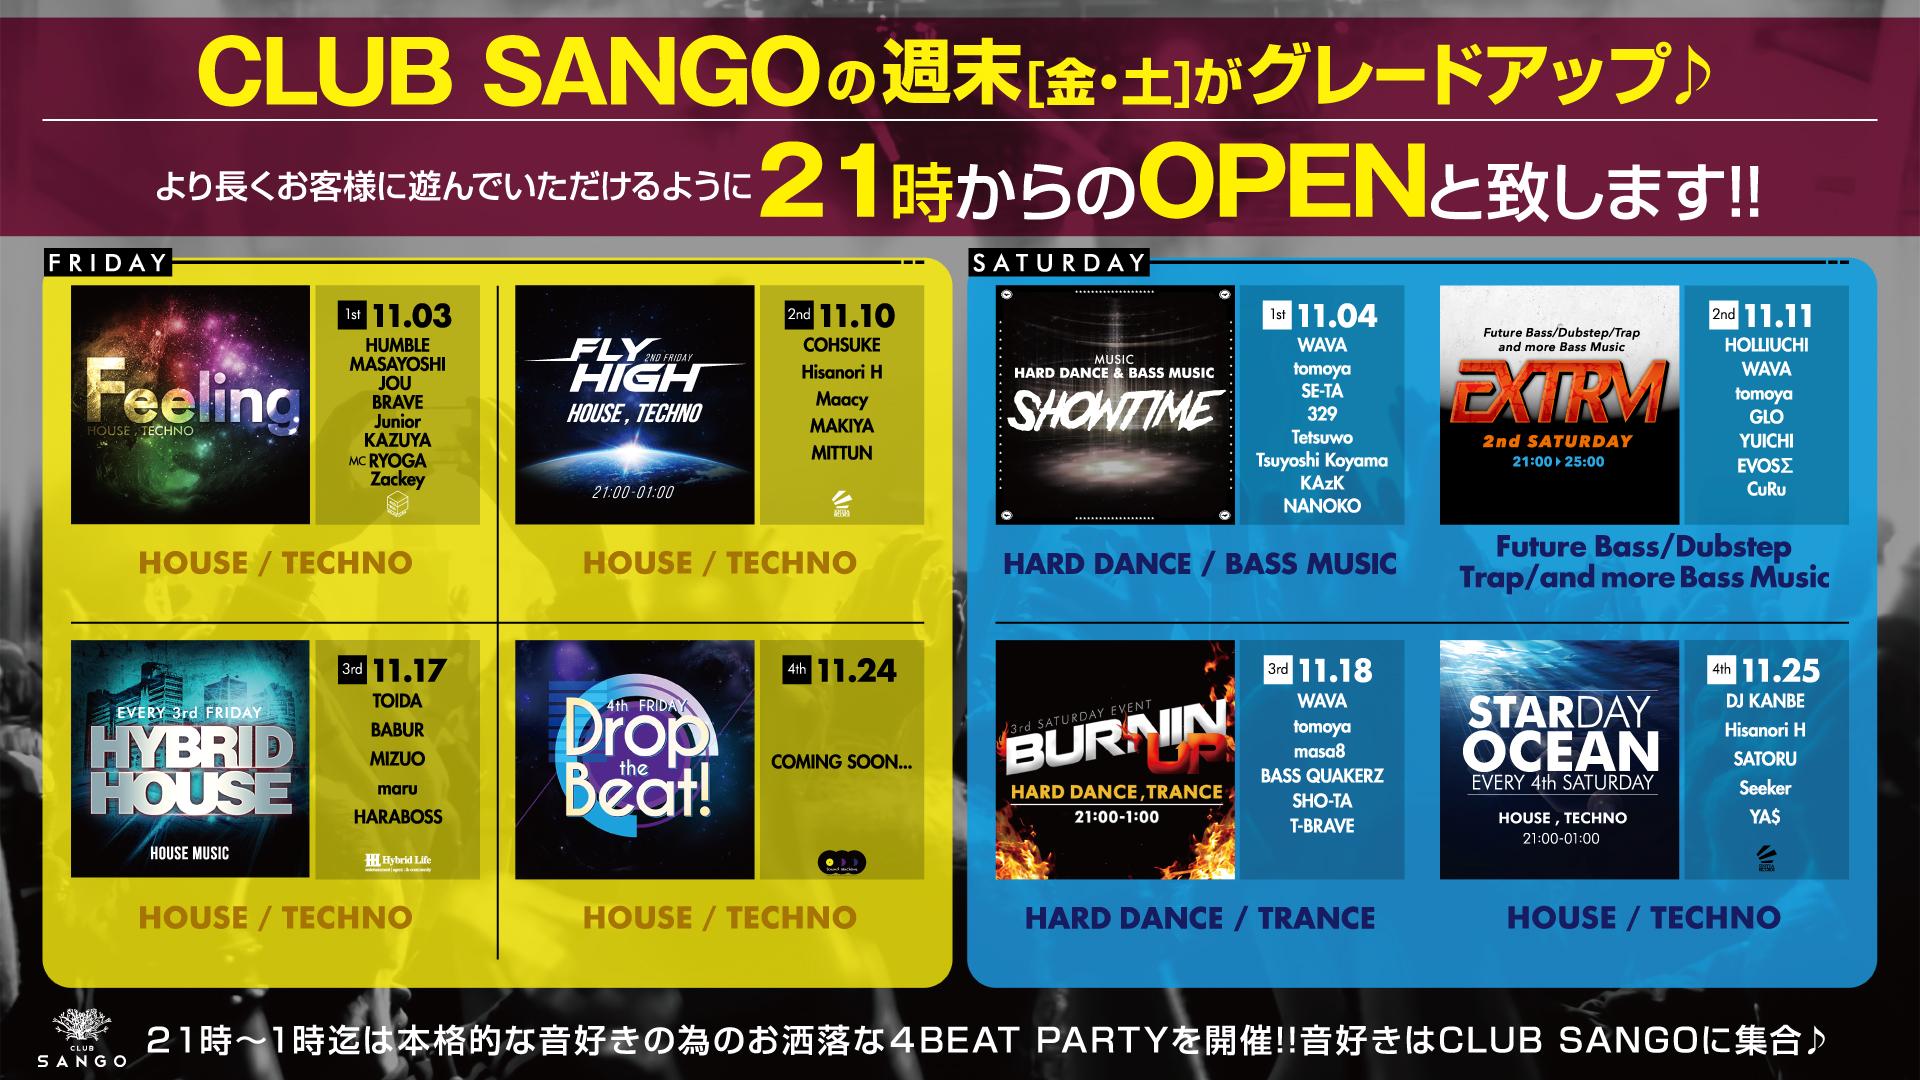 CLUB SANGOの週末[金・土]がグレードアップ ♪